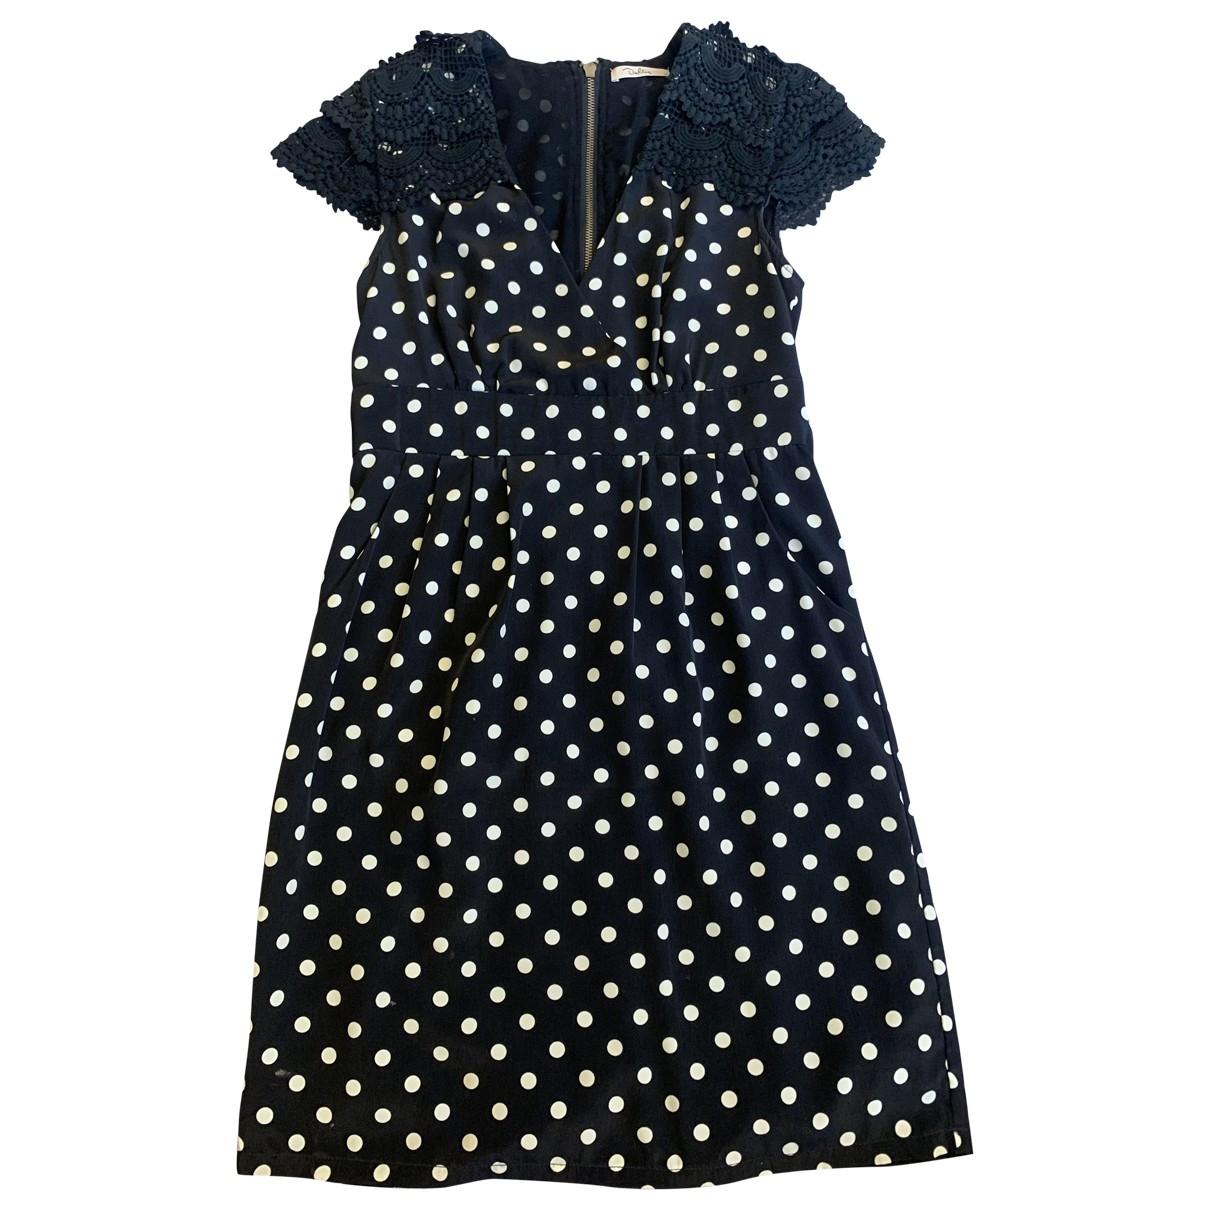 Darling \N Black dress for Women S International